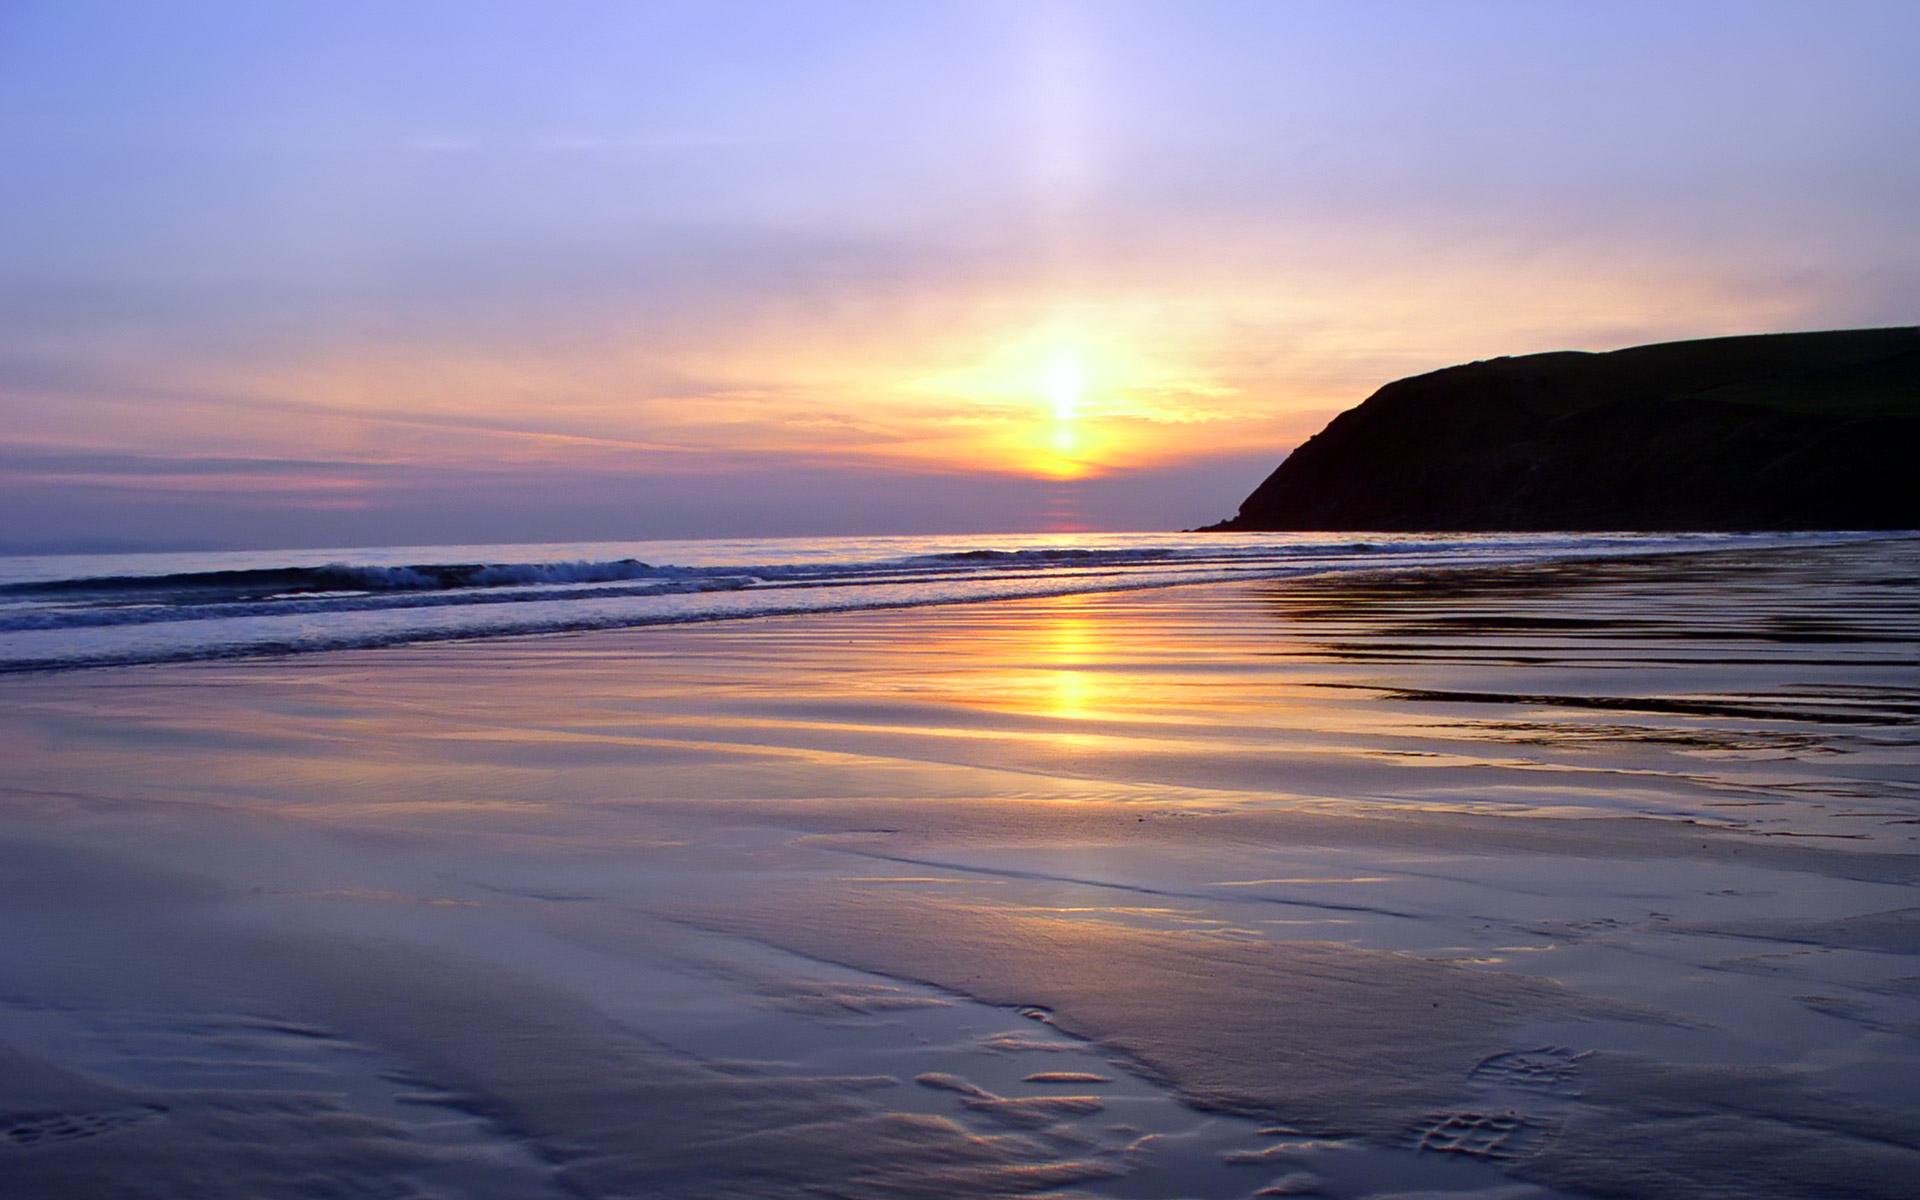 Beautiful Sunset Beach Wallpapers 19201200 127935 HD Wallpaper Res 1920x1200